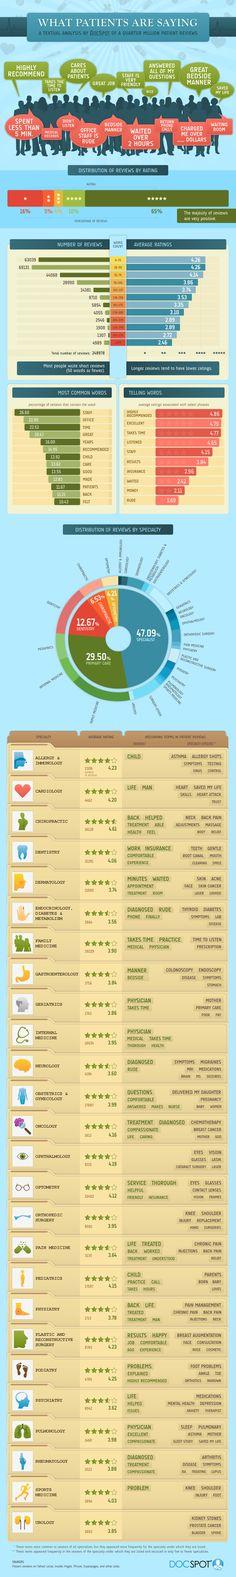 Infographic analysis of a quarter million patient reviews.